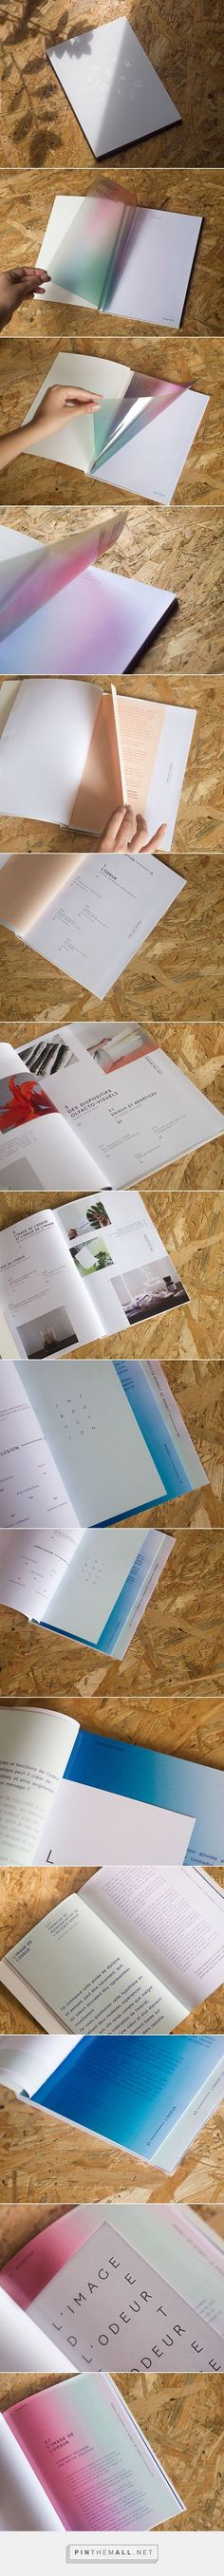 Design graphique hyperosmique (https://www.behance.net/gallery/18377841/Design-graphique-hyperosmique)